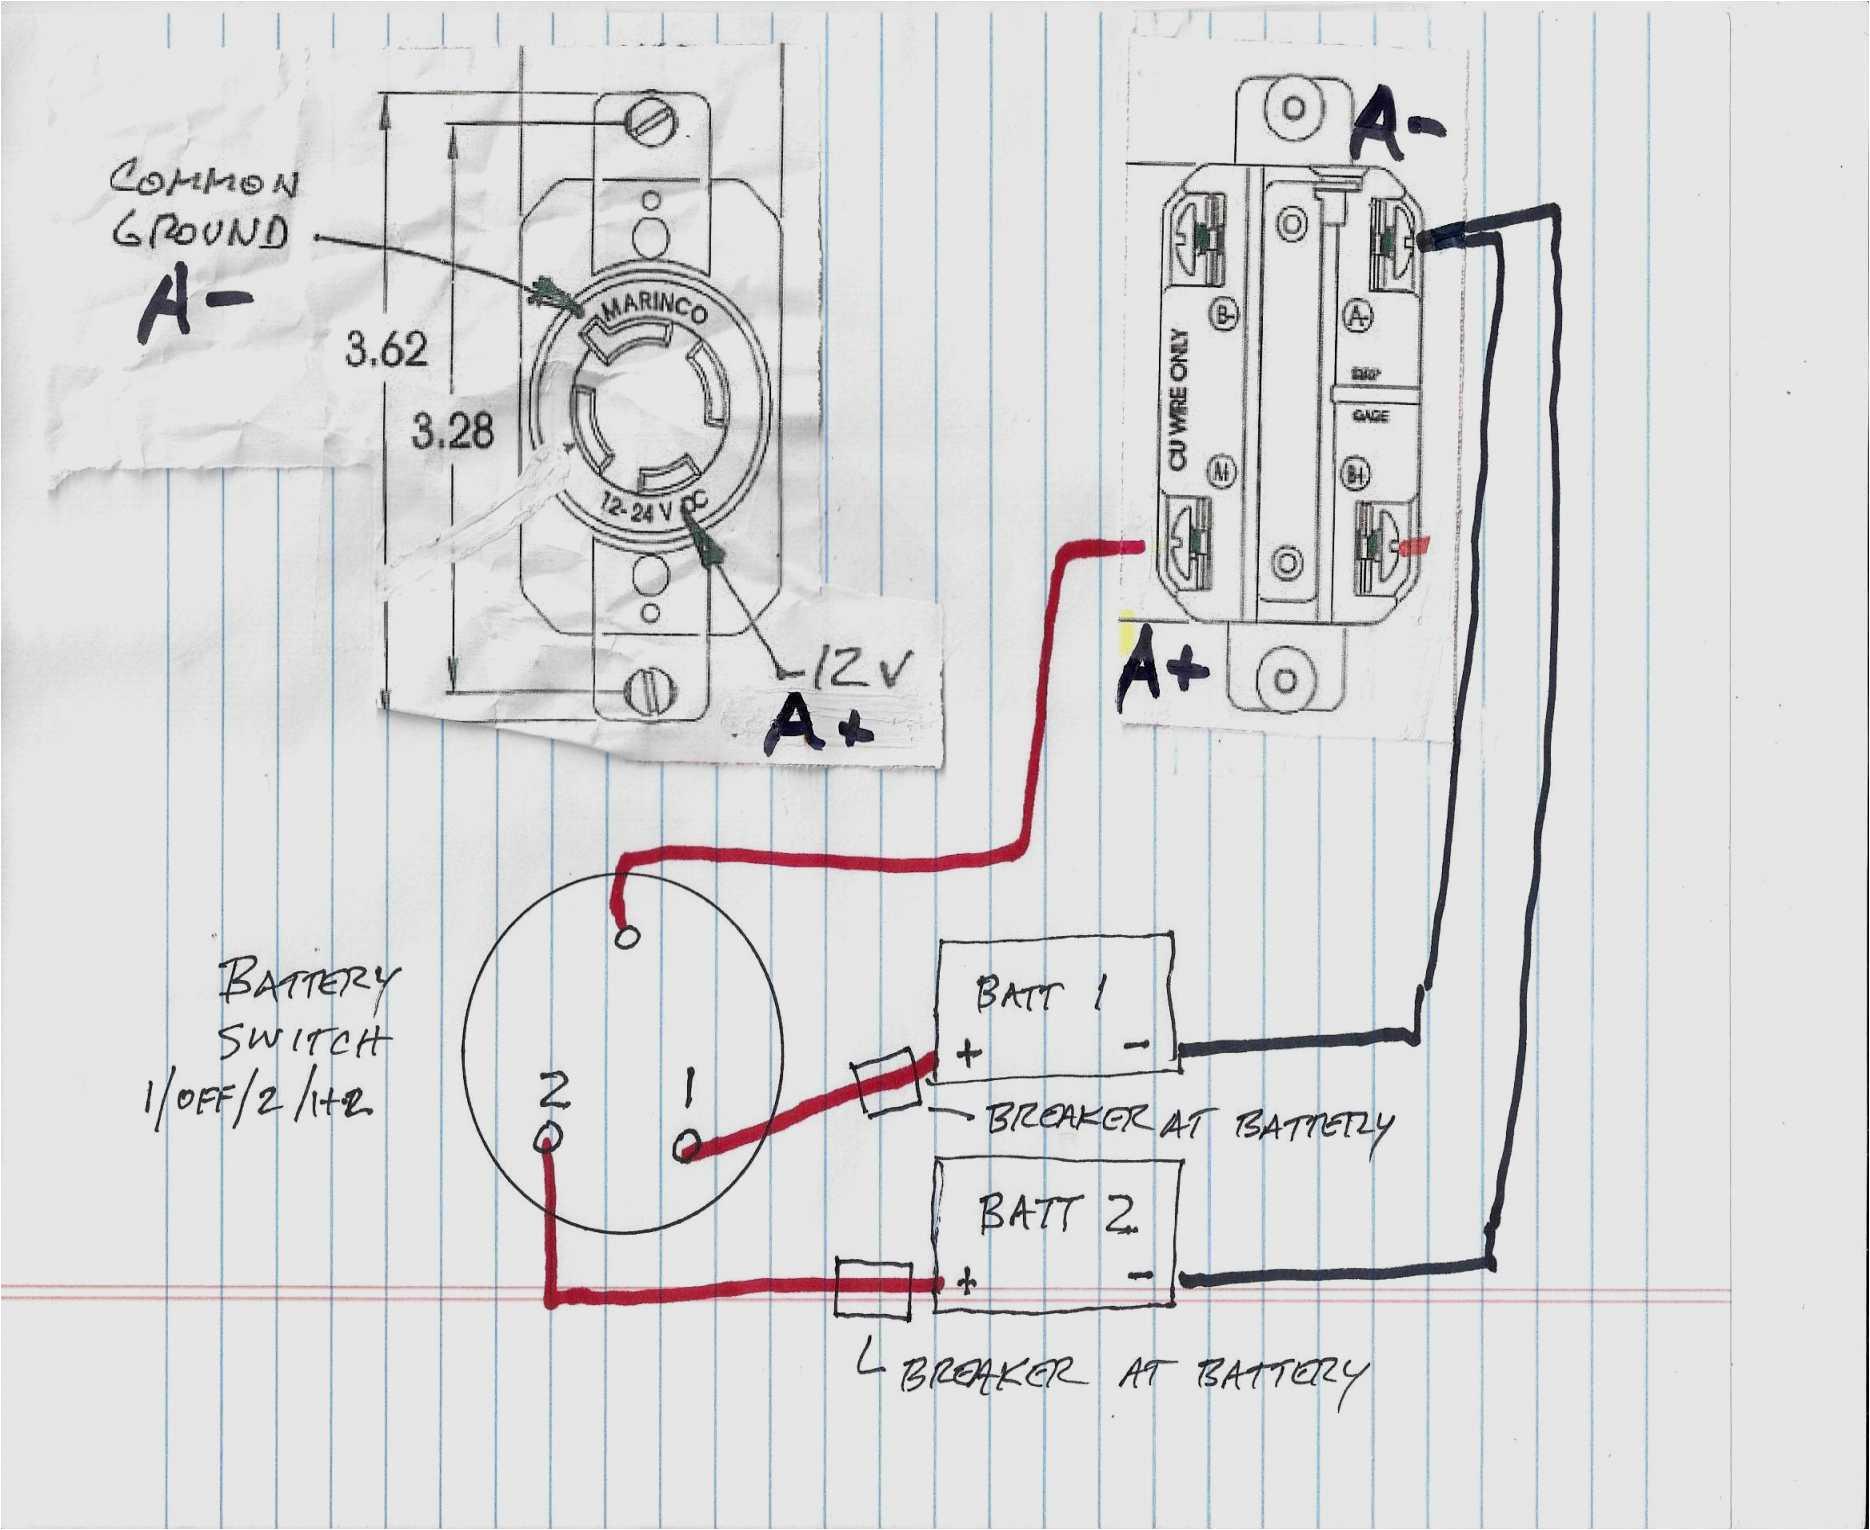 36 volt trolling motor wiring diagram 24v trolling motor wiring diagram wiring solutions of 36 volt trolling motor wiring diagram jpg